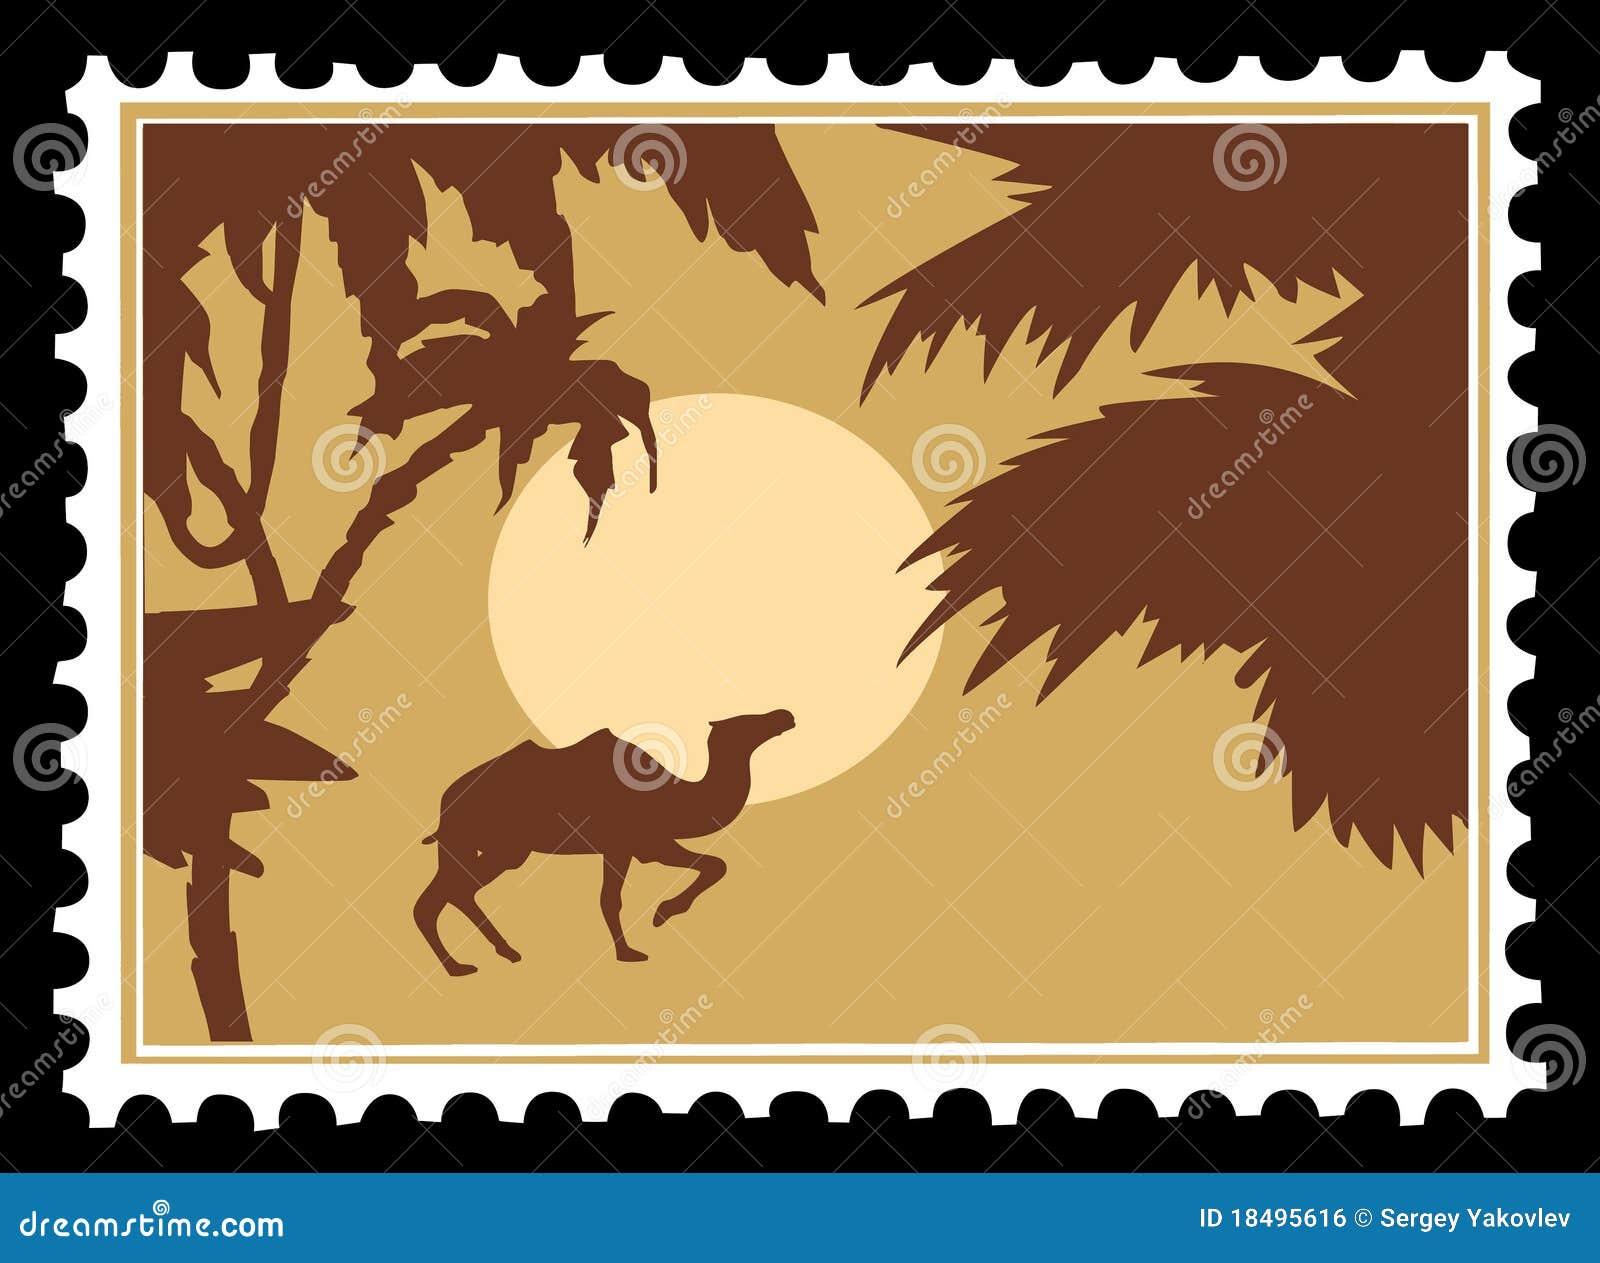 vector scenery tropical - photo #43